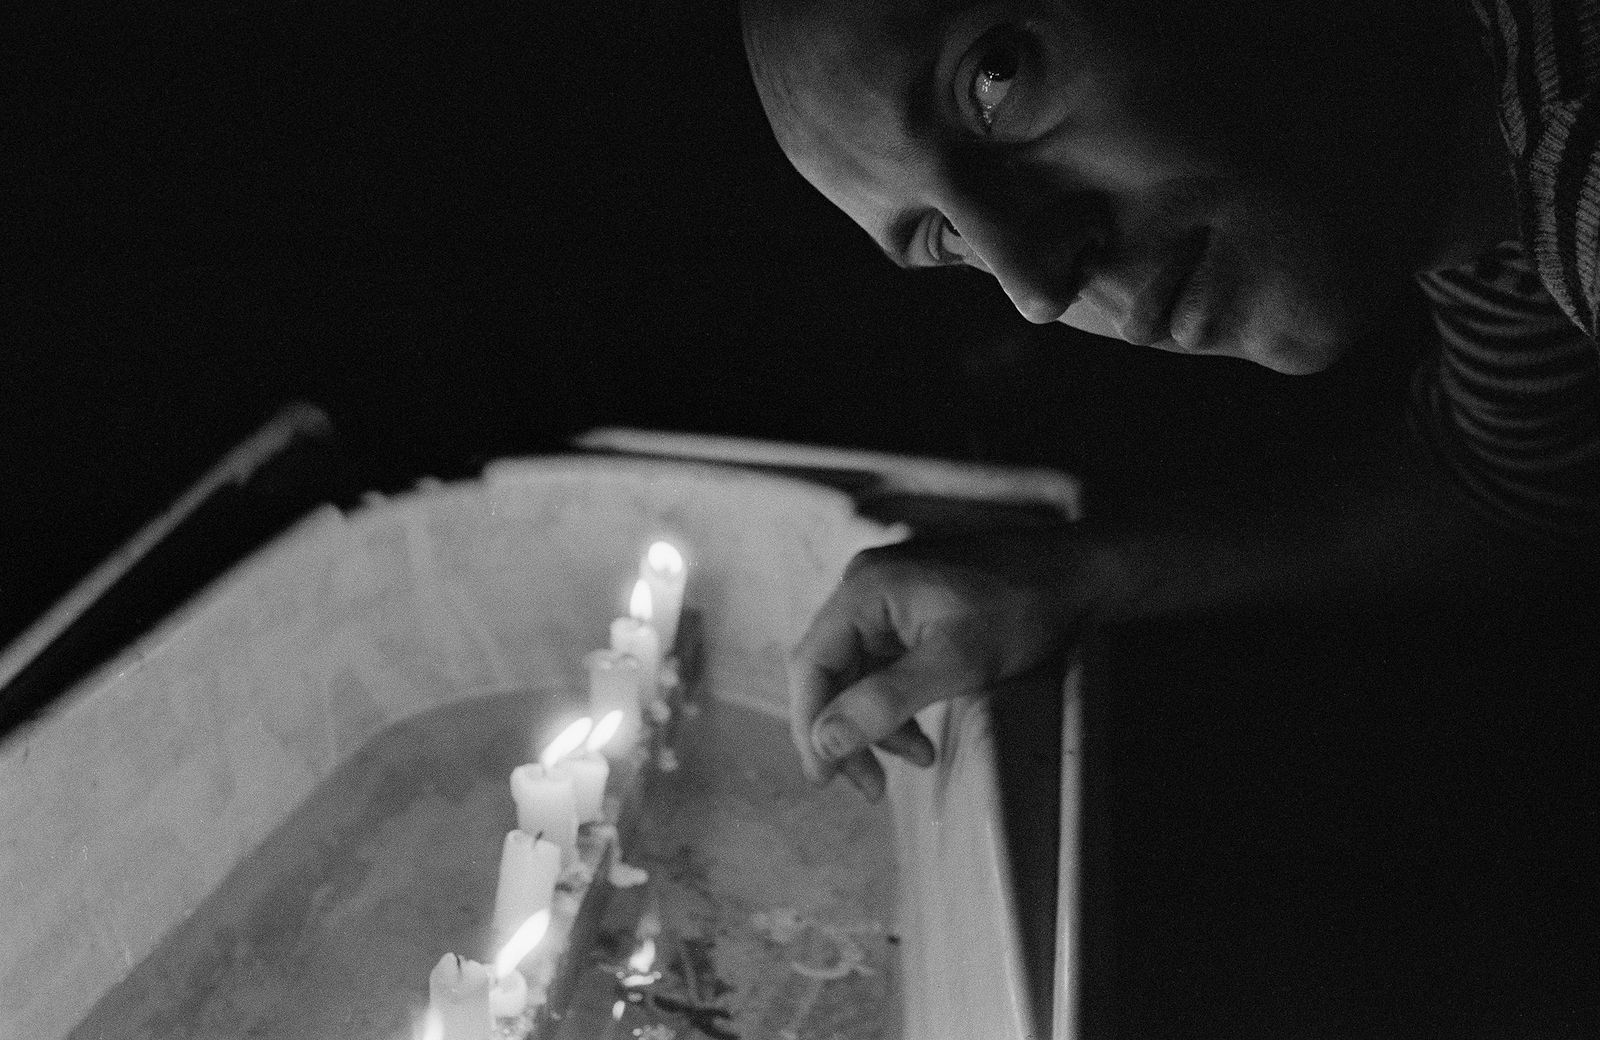 Андрей Безукладников. Совриск. Герман Виноградов. Москва. 1988